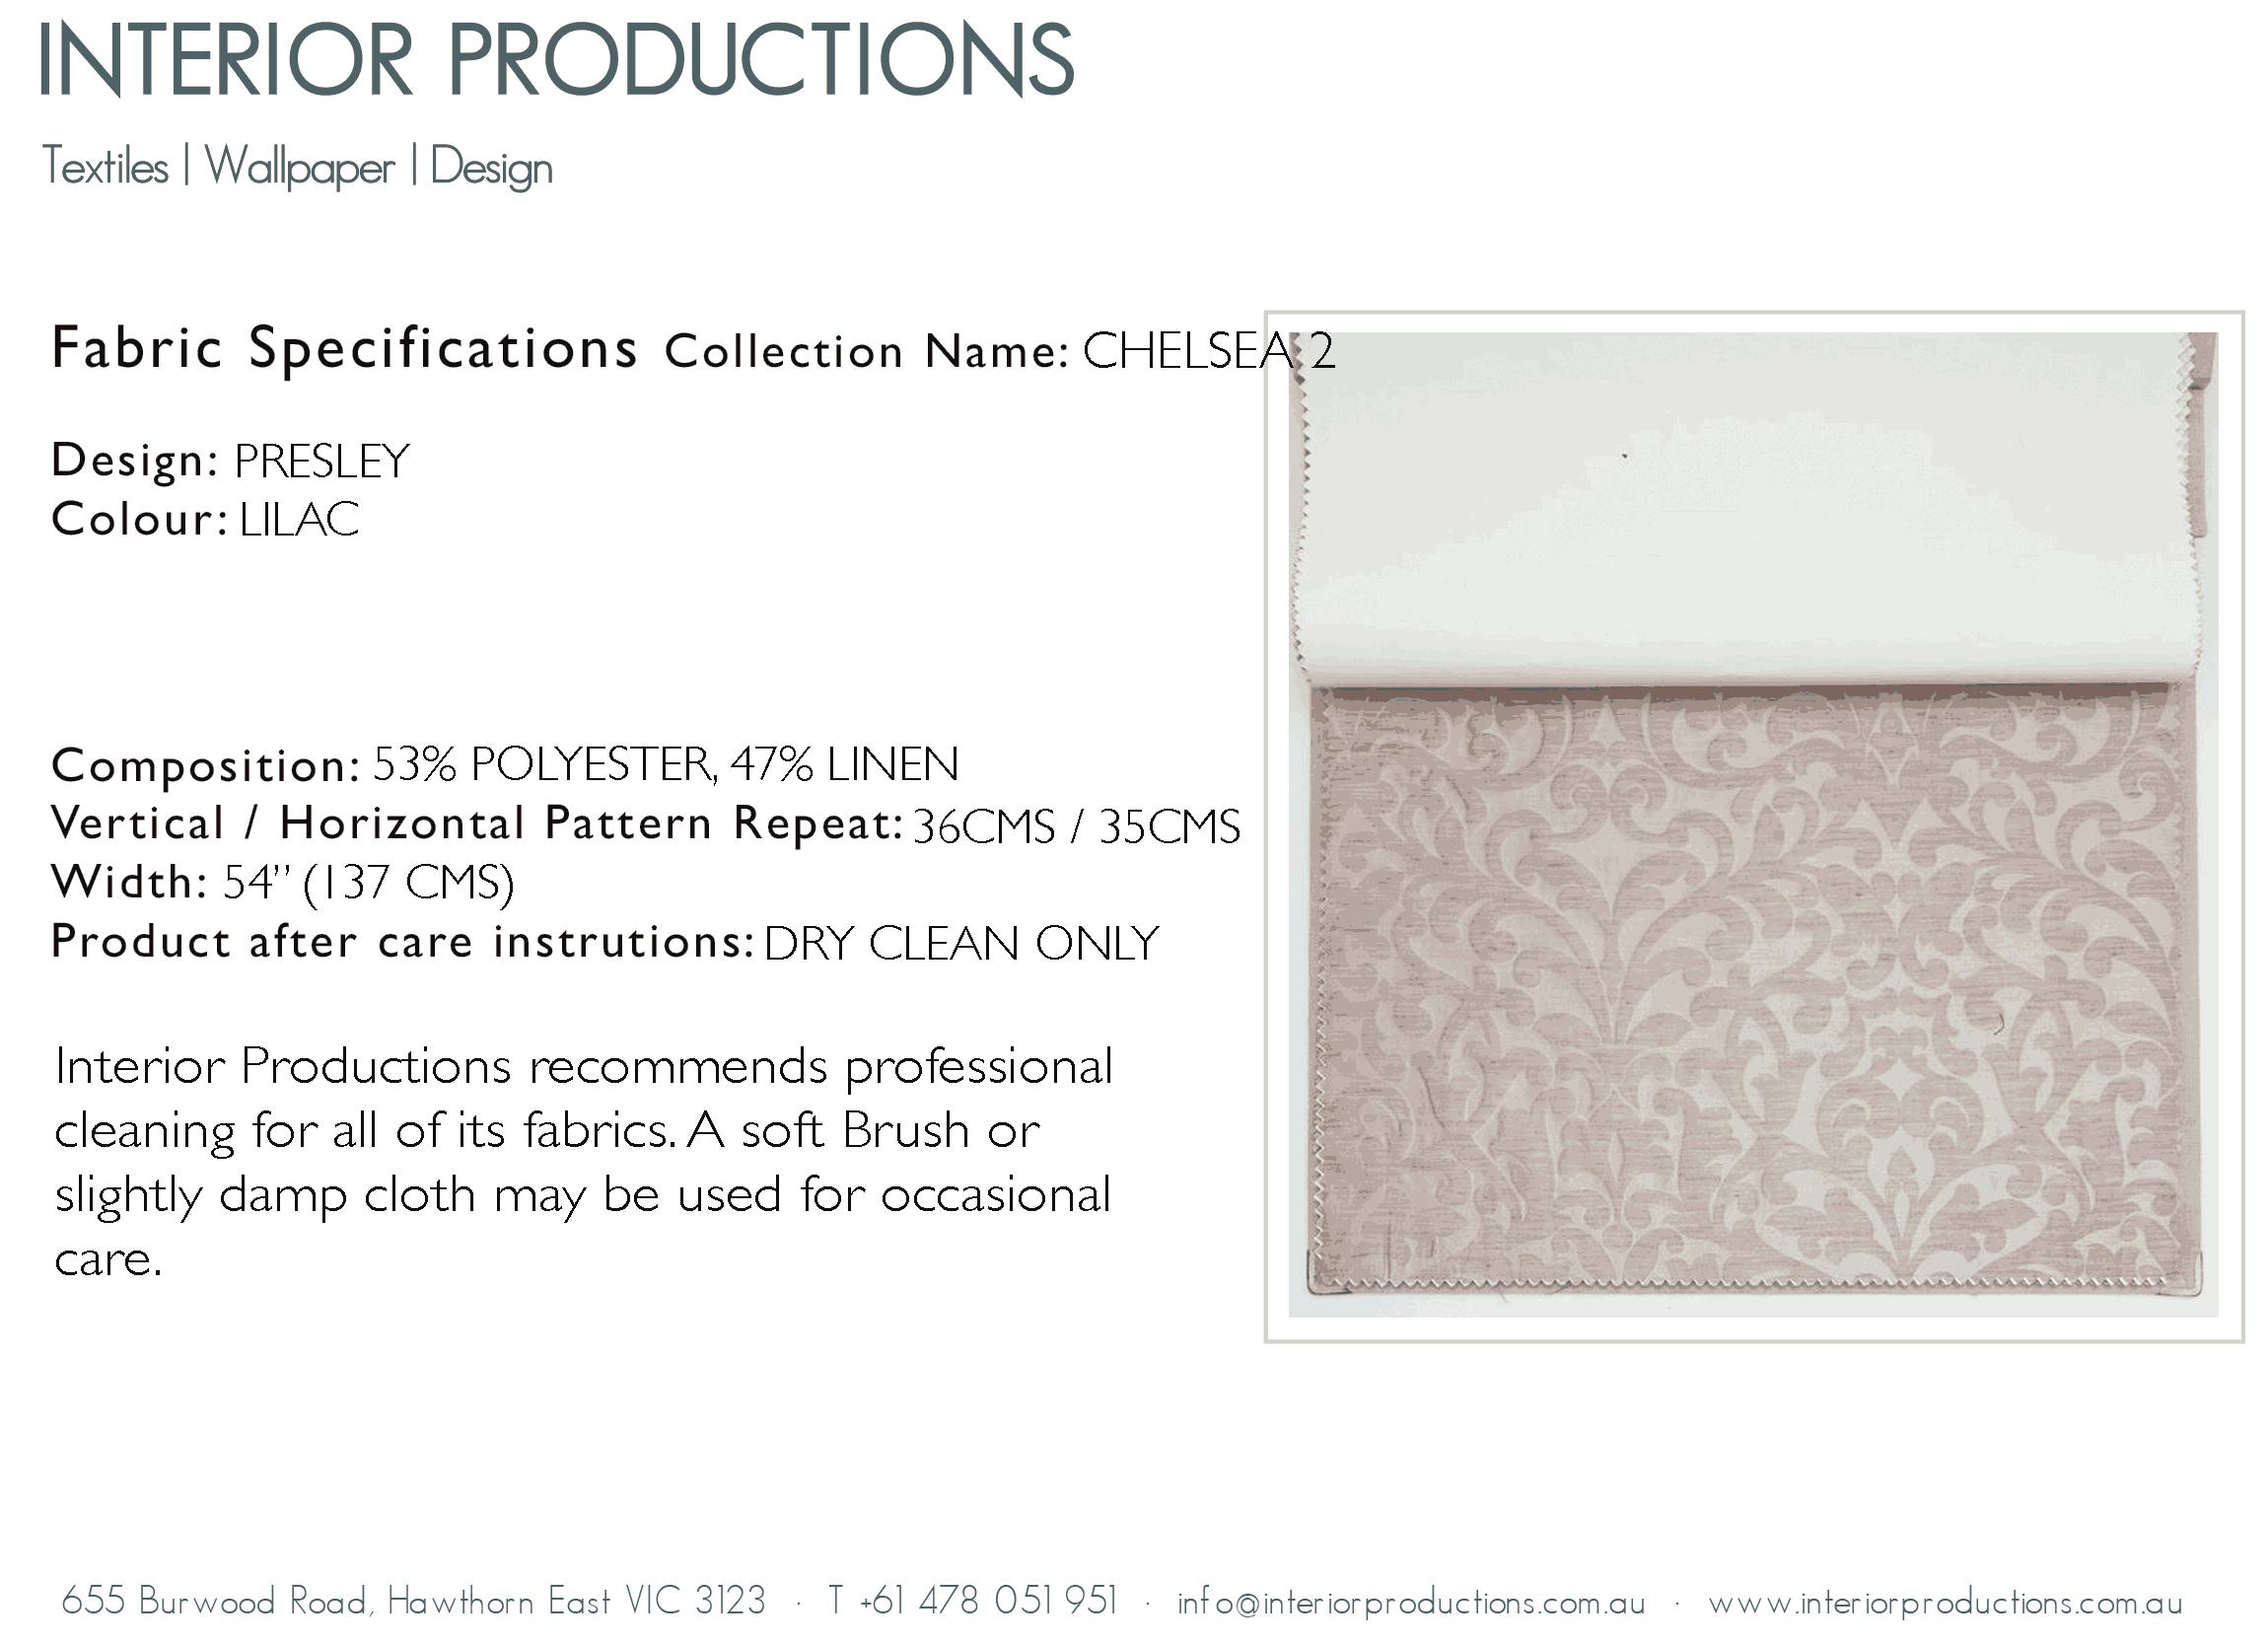 interior_productions_PRESLEY---LILAC